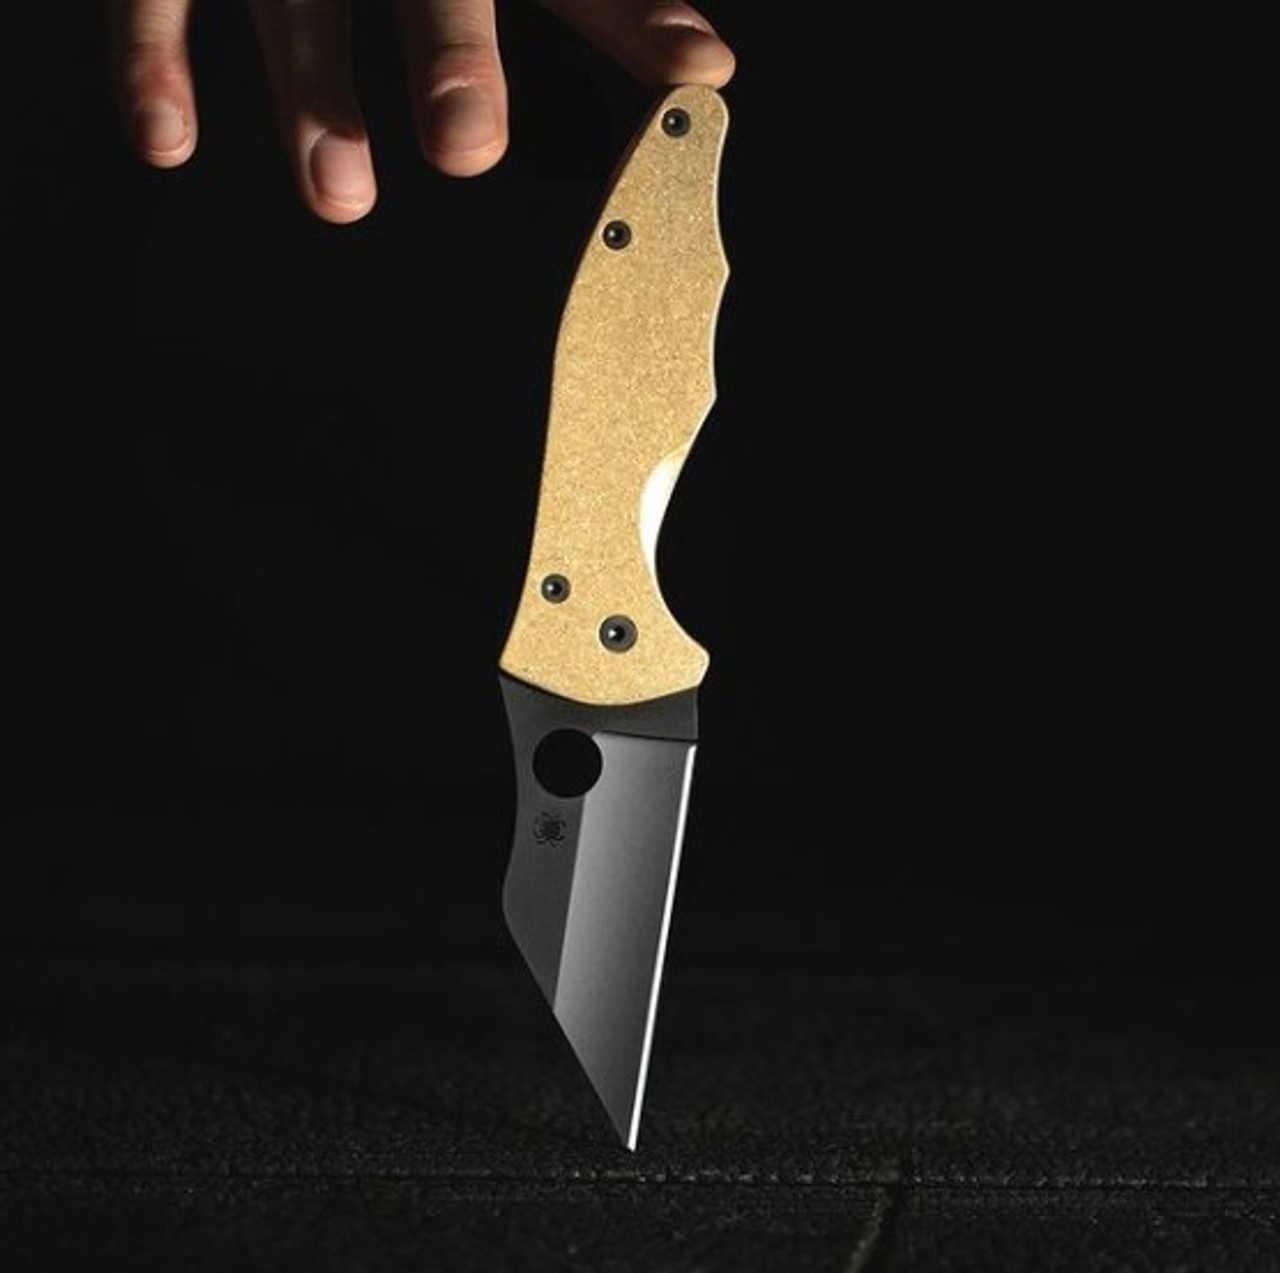 Flytanium Stonewahsed Brass Scales - for Spyderco Yojimbo Knife